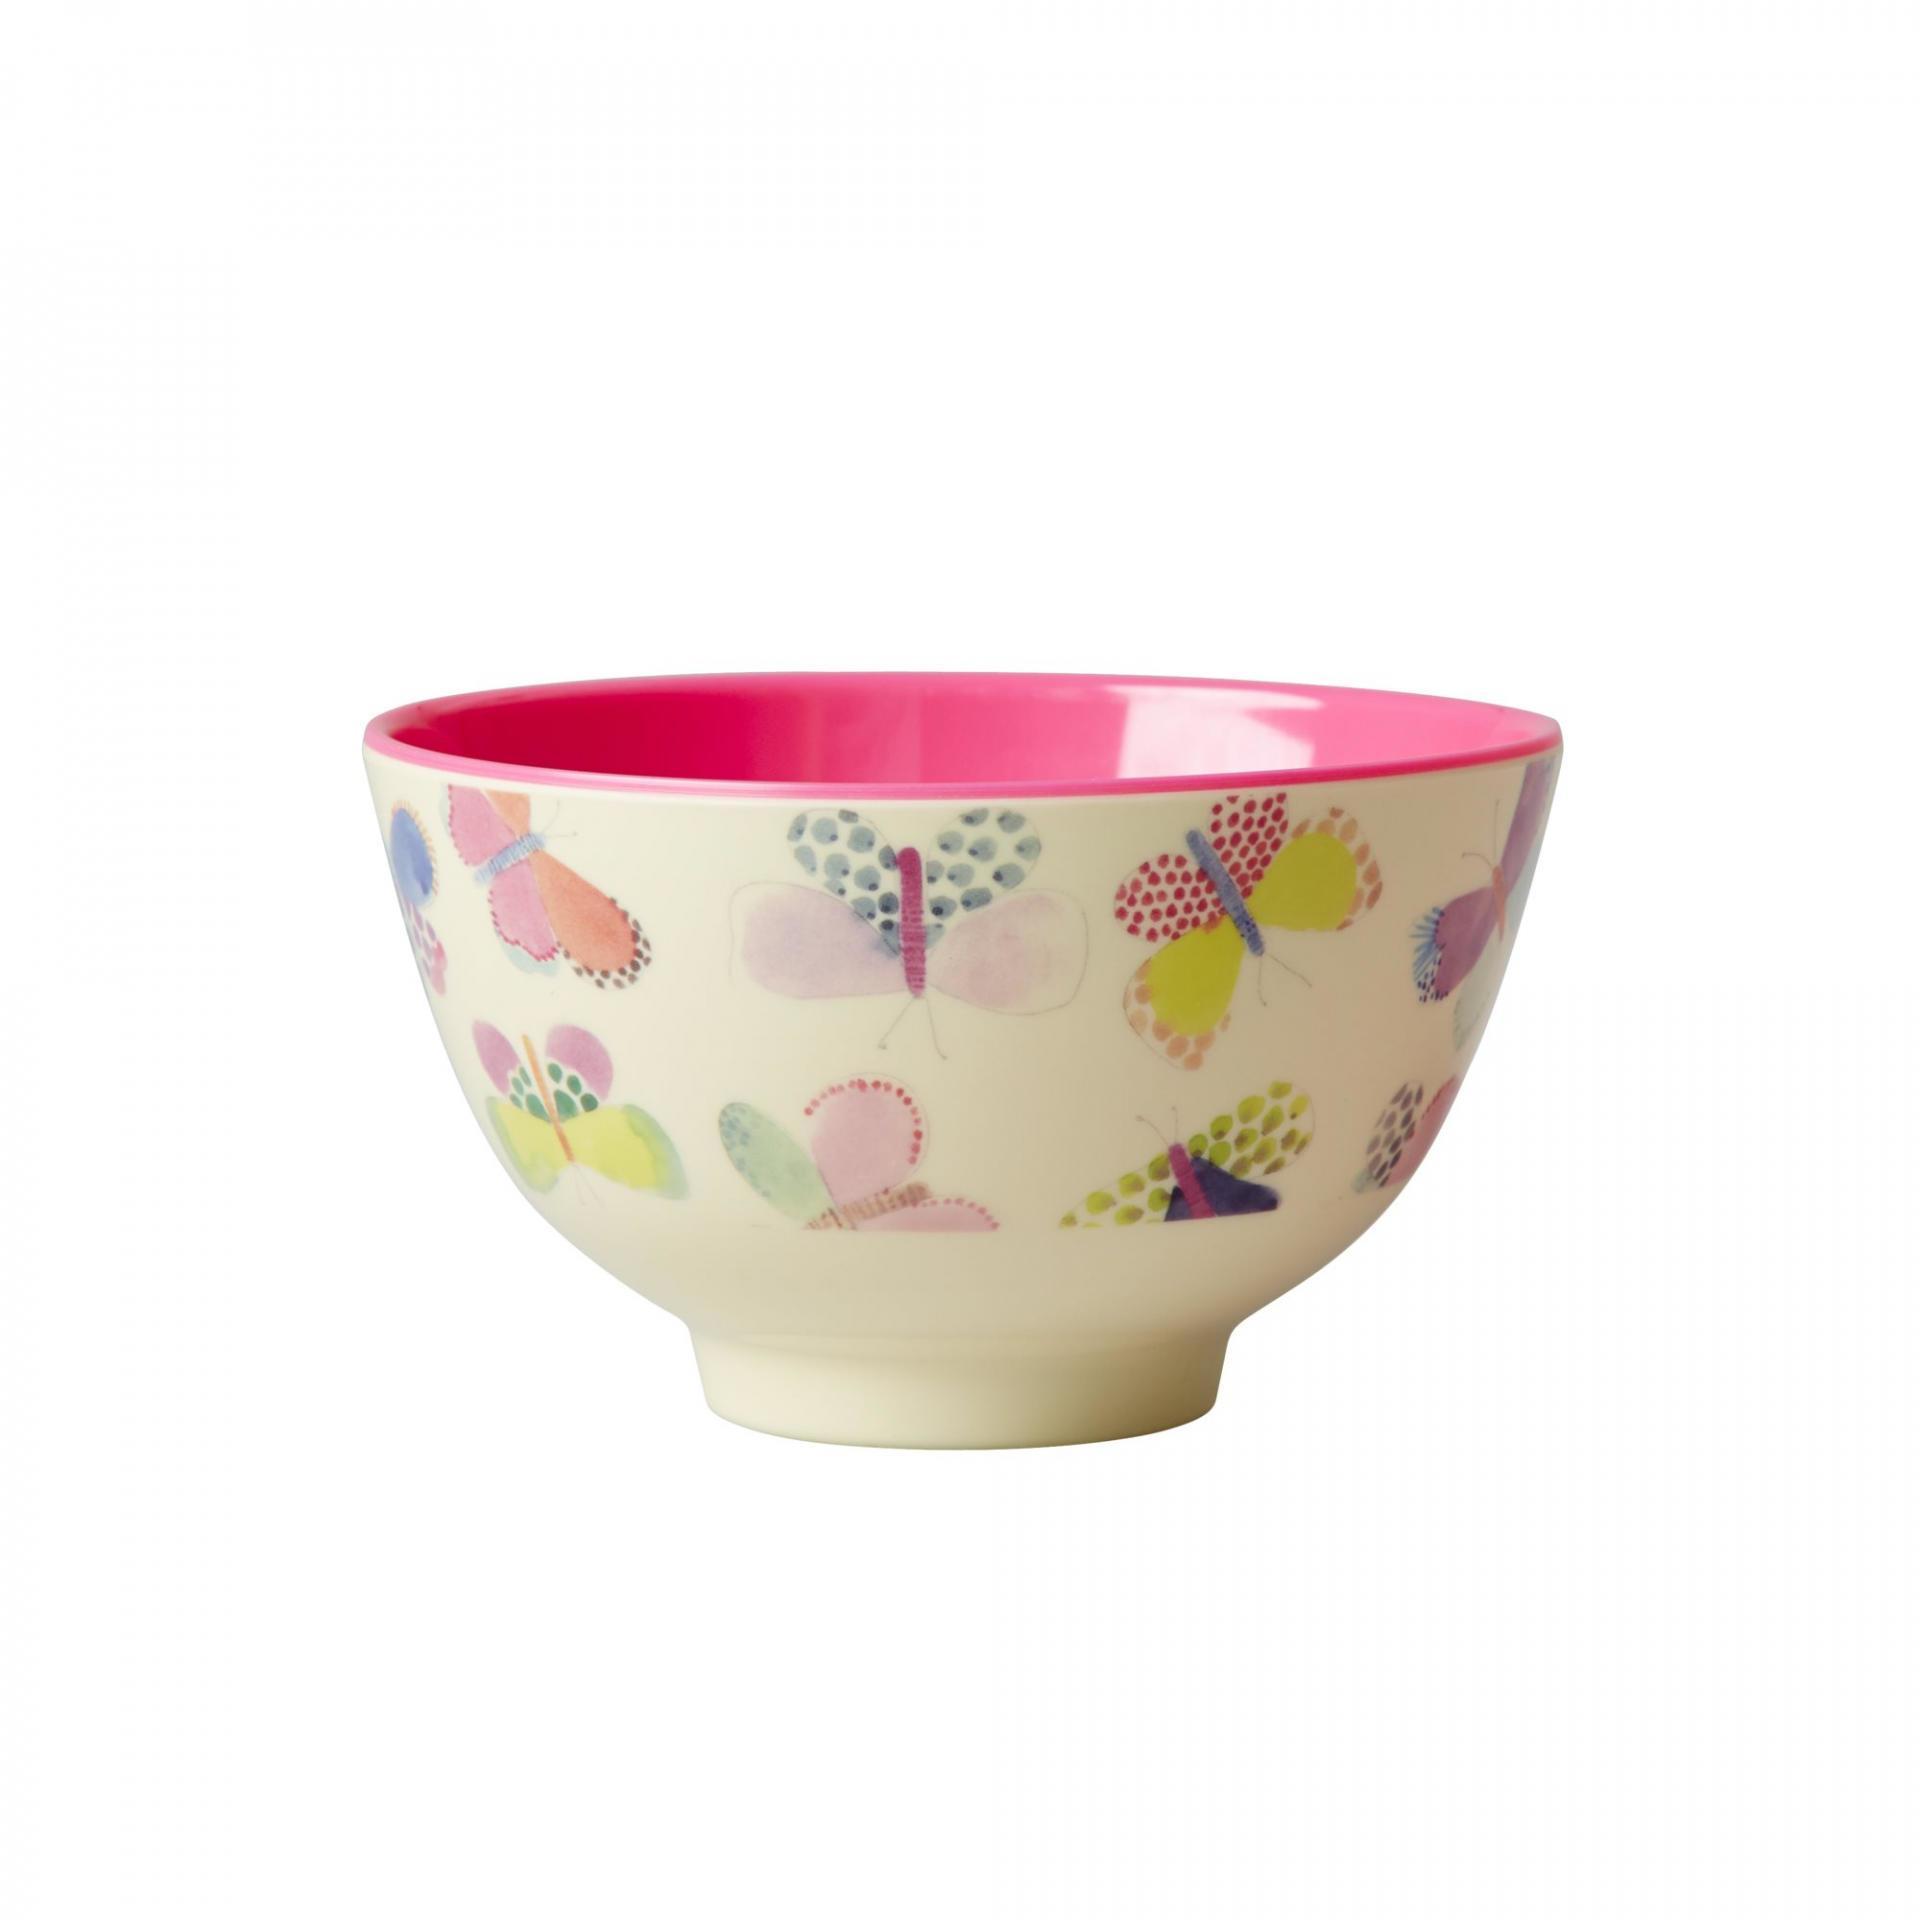 rice Melaminová miska Butterfly small, růžová barva, multi barva, melamin